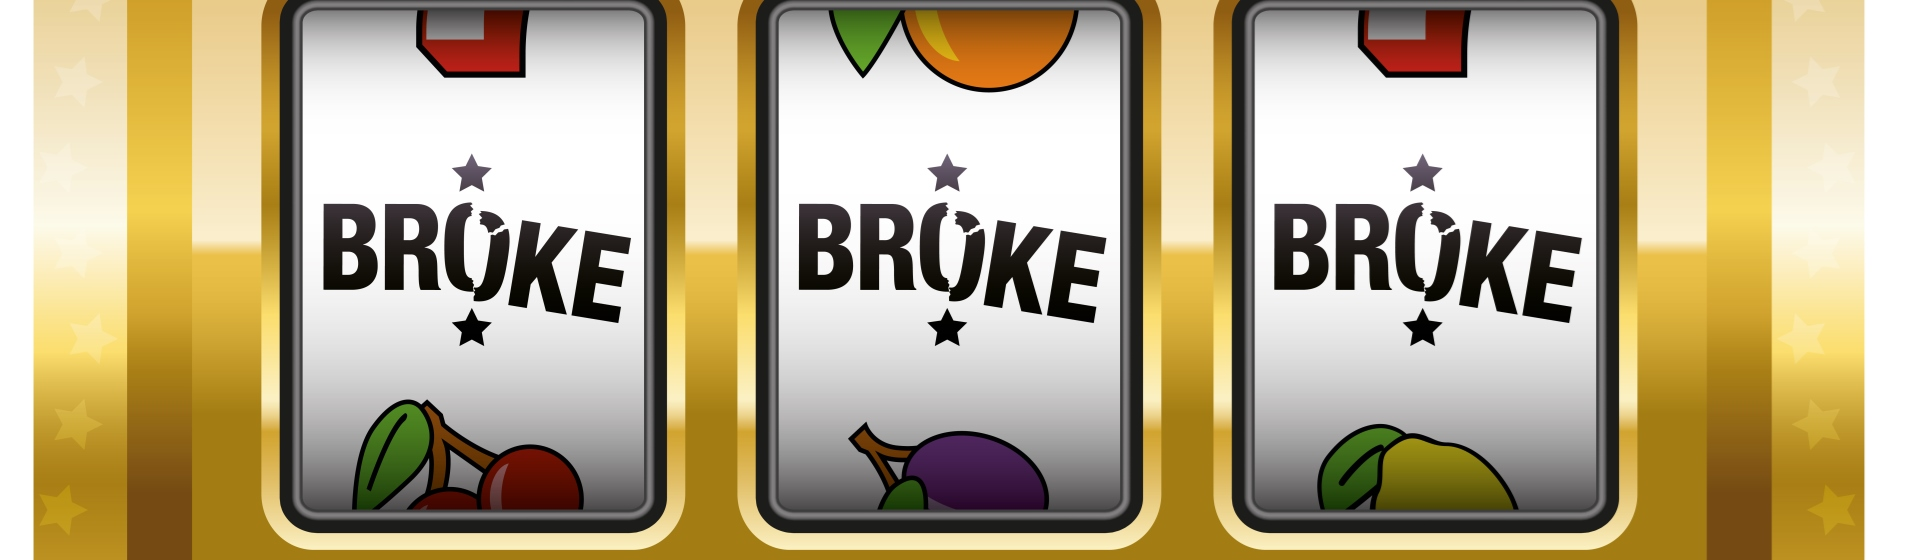 Slot machine windows say broke